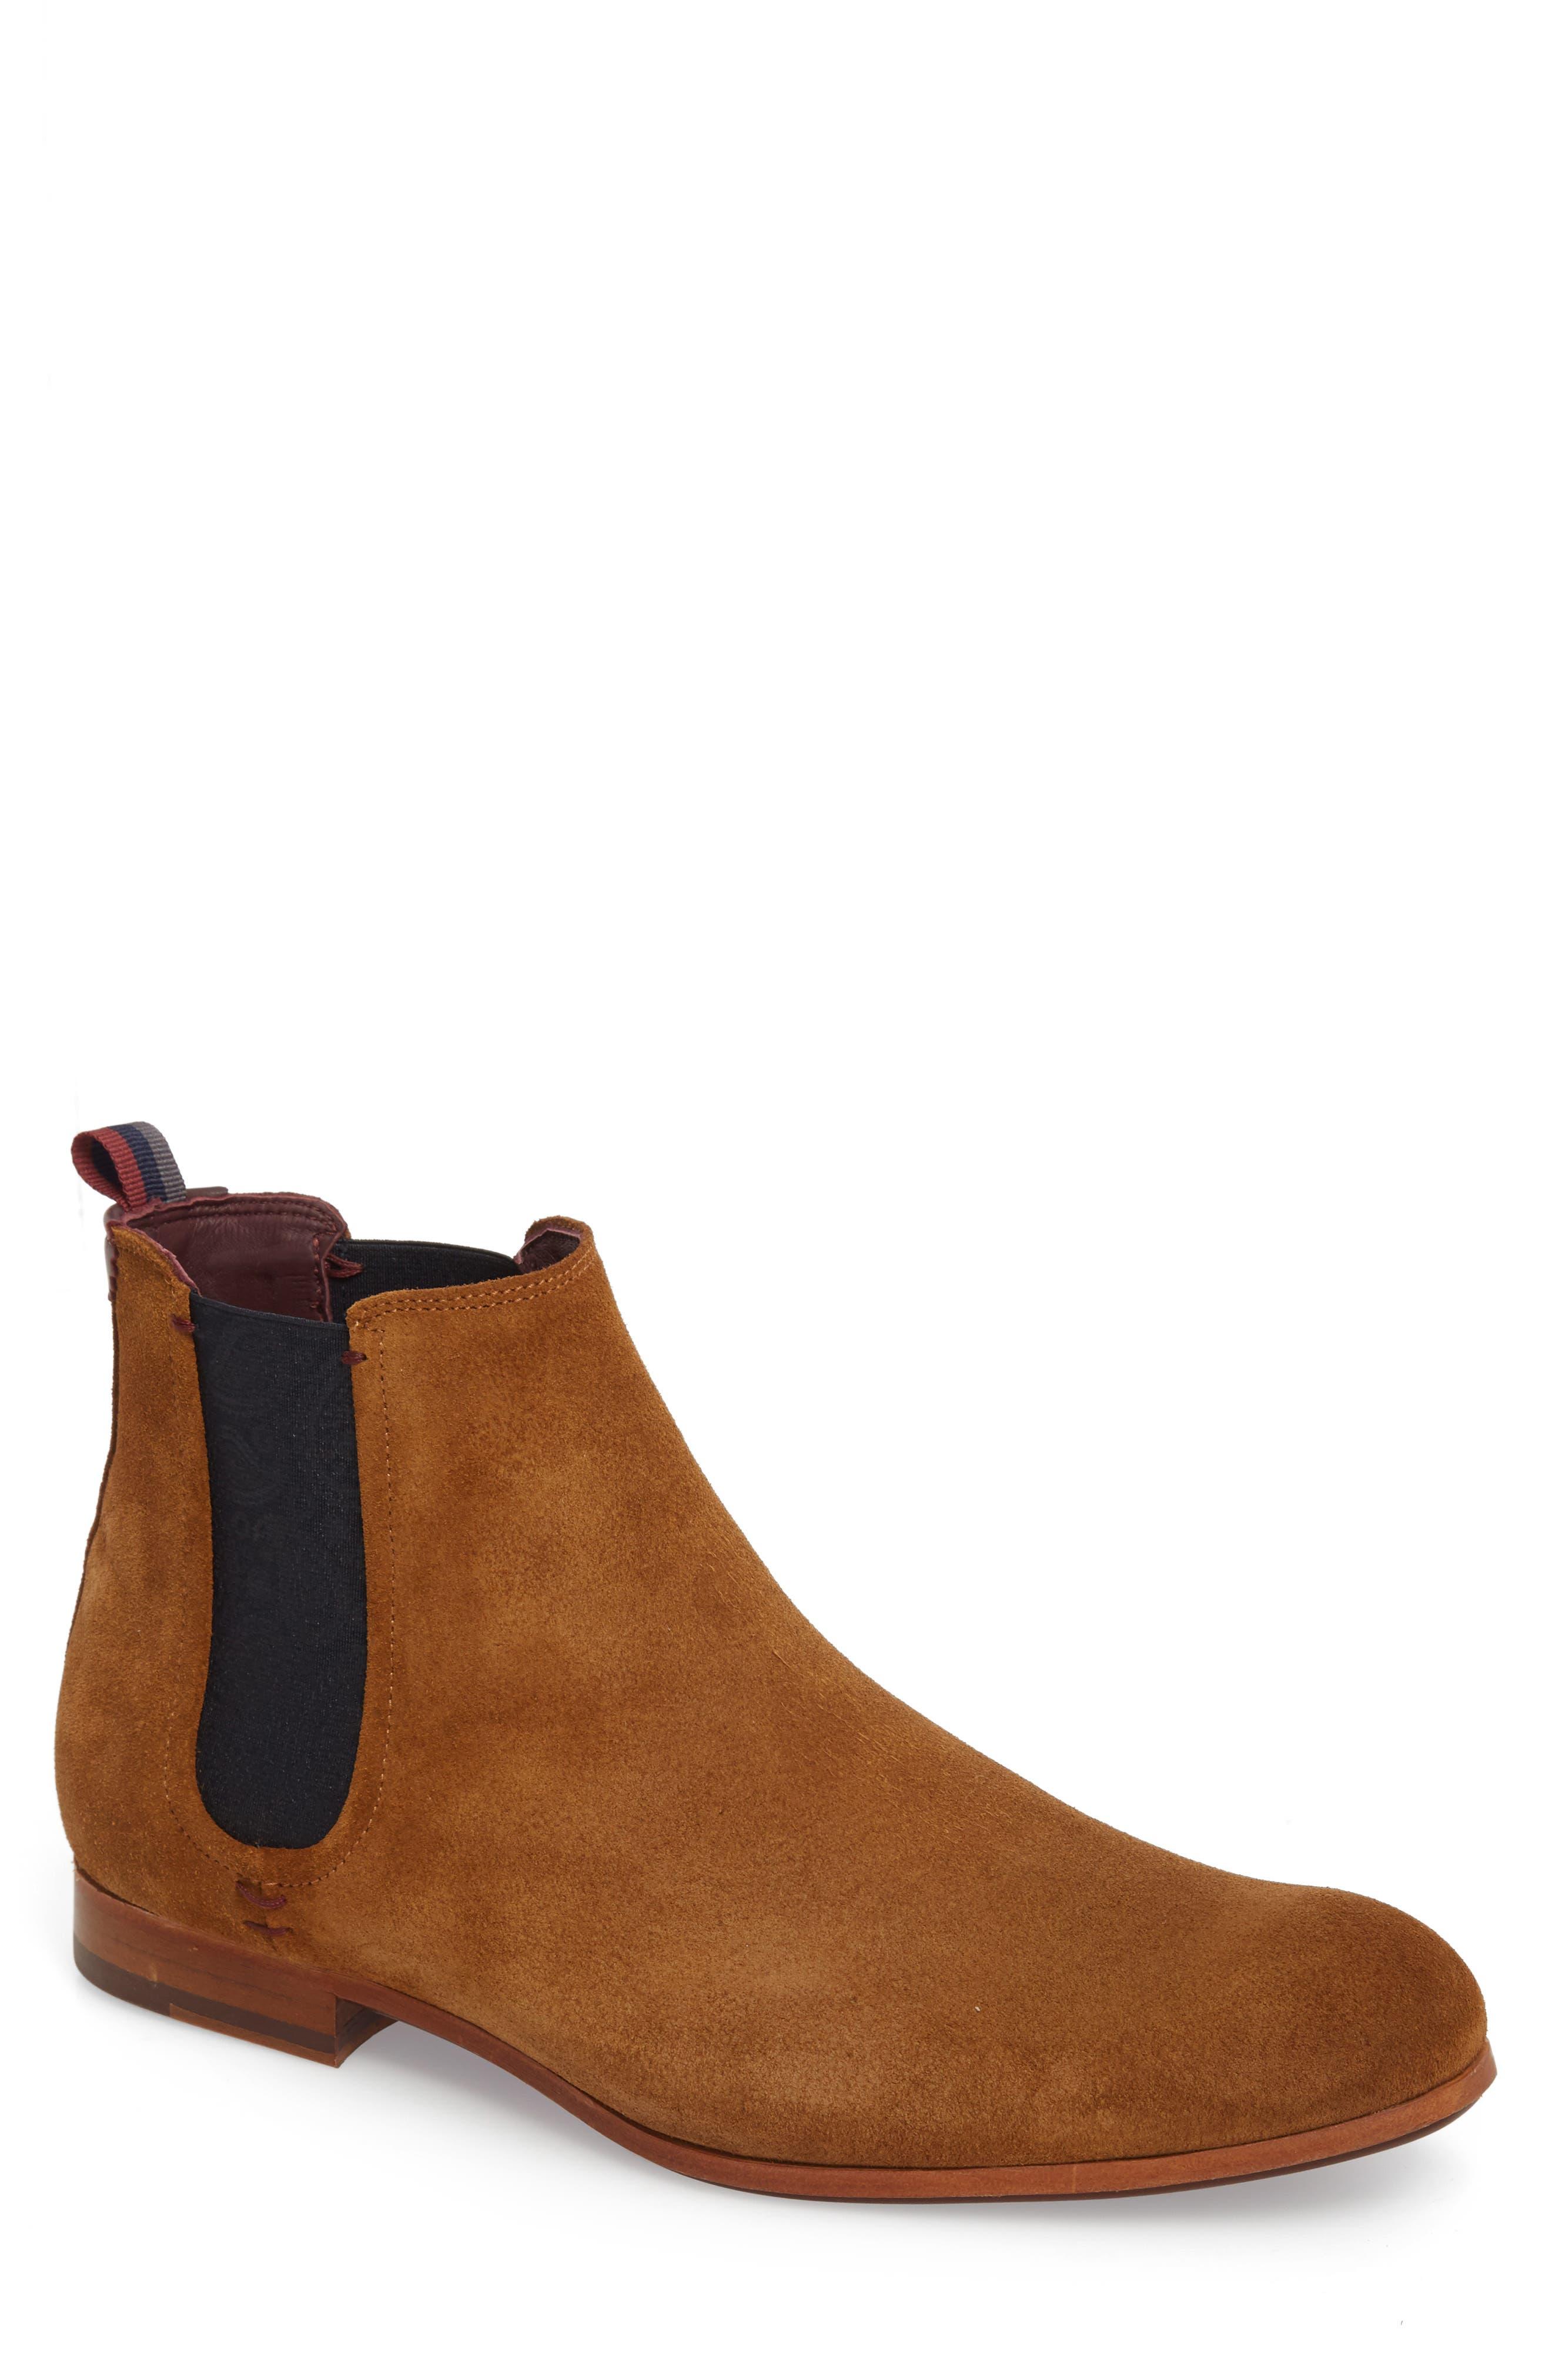 Saldor Mid Chelsea Boot,                         Main,                         color, 204